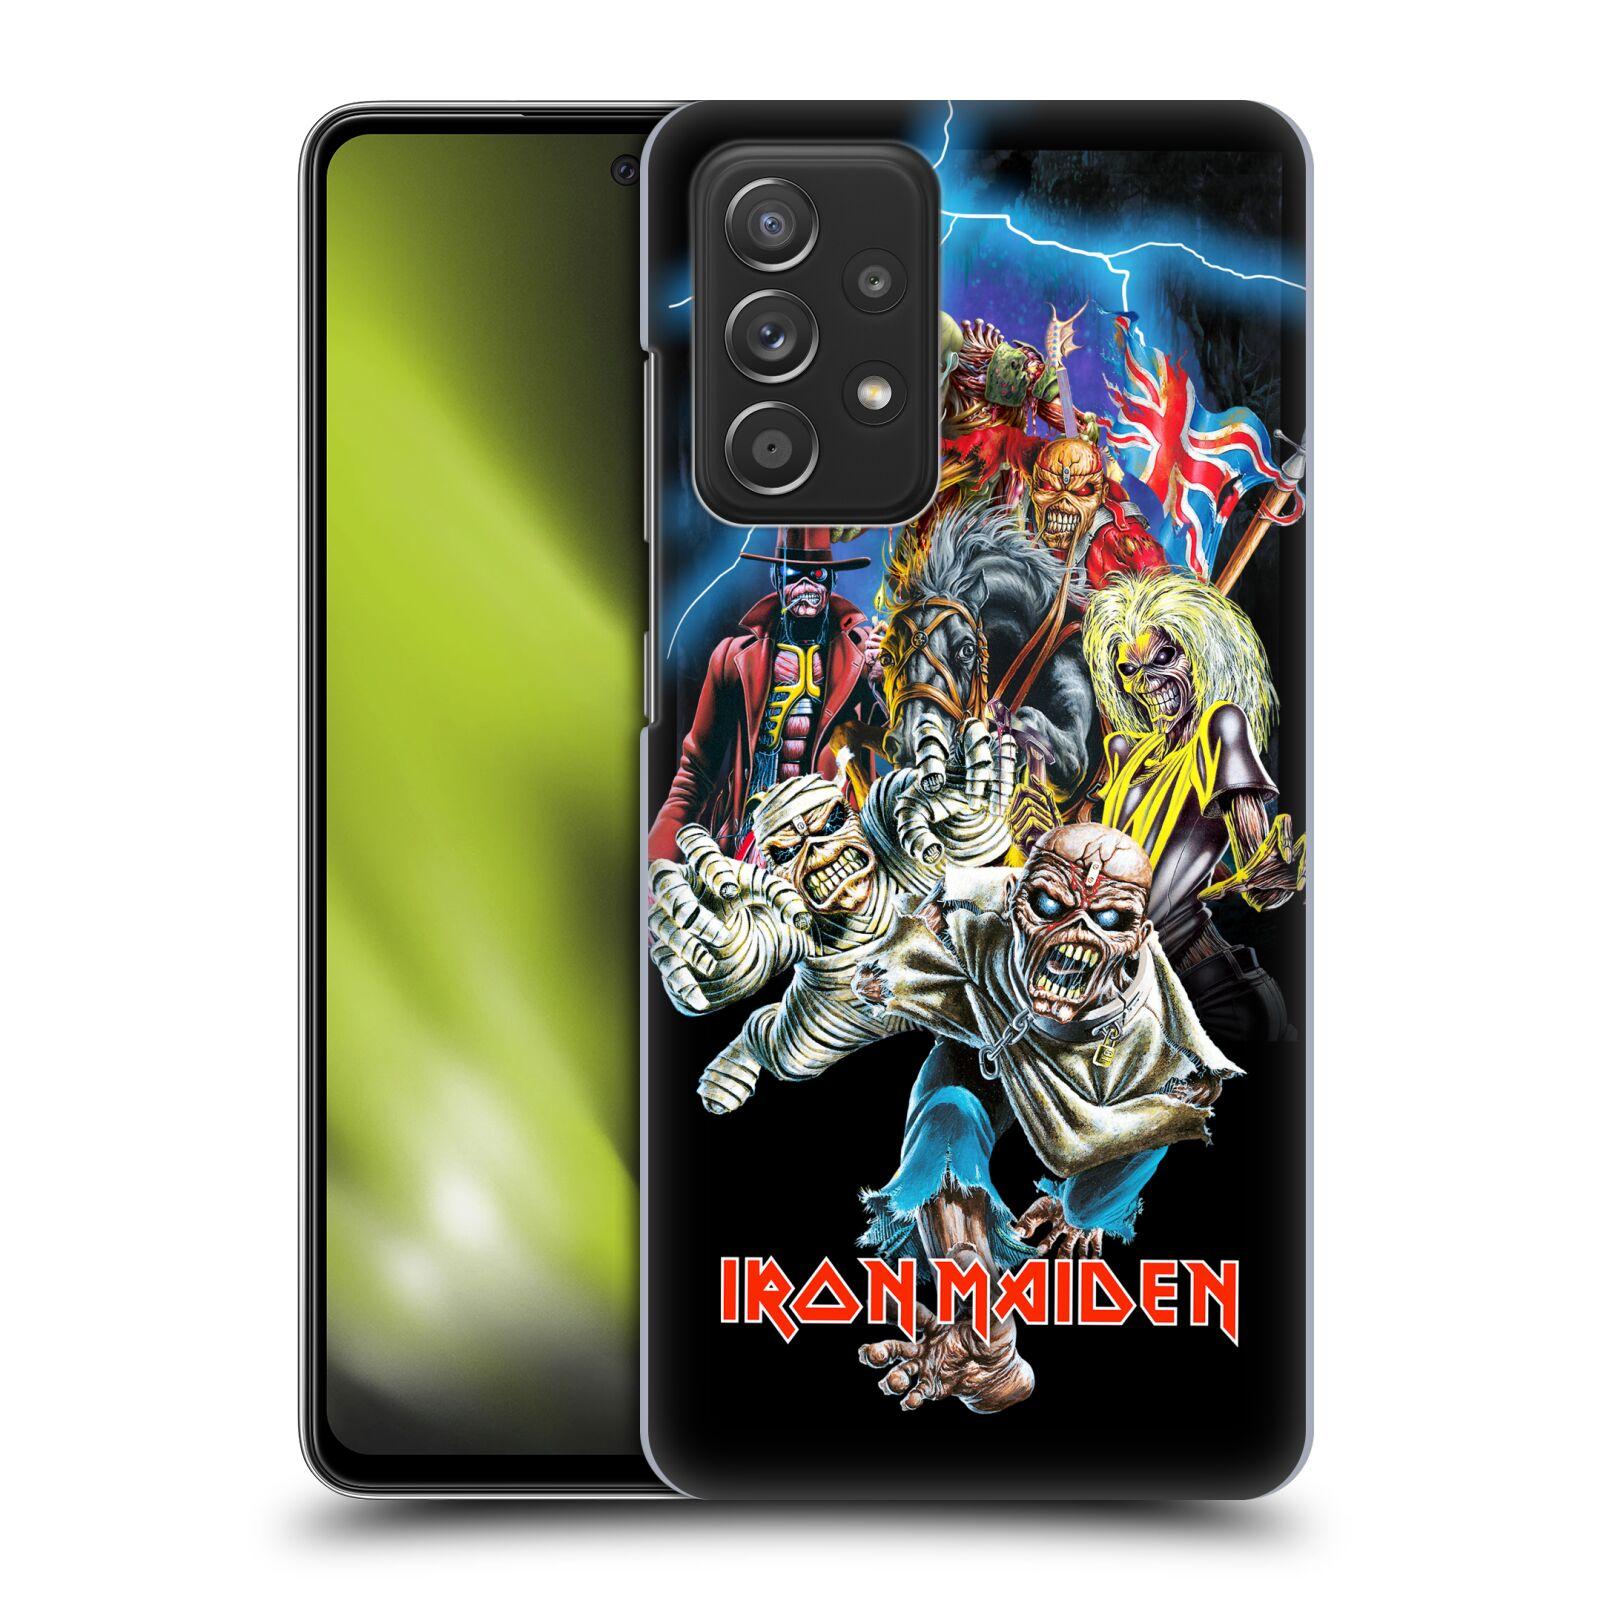 Plastové pouzdro na mobil Samsung Galaxy A52 / A52 5G / A52s 5G - Head Case - Iron Maiden - Best Of Beast